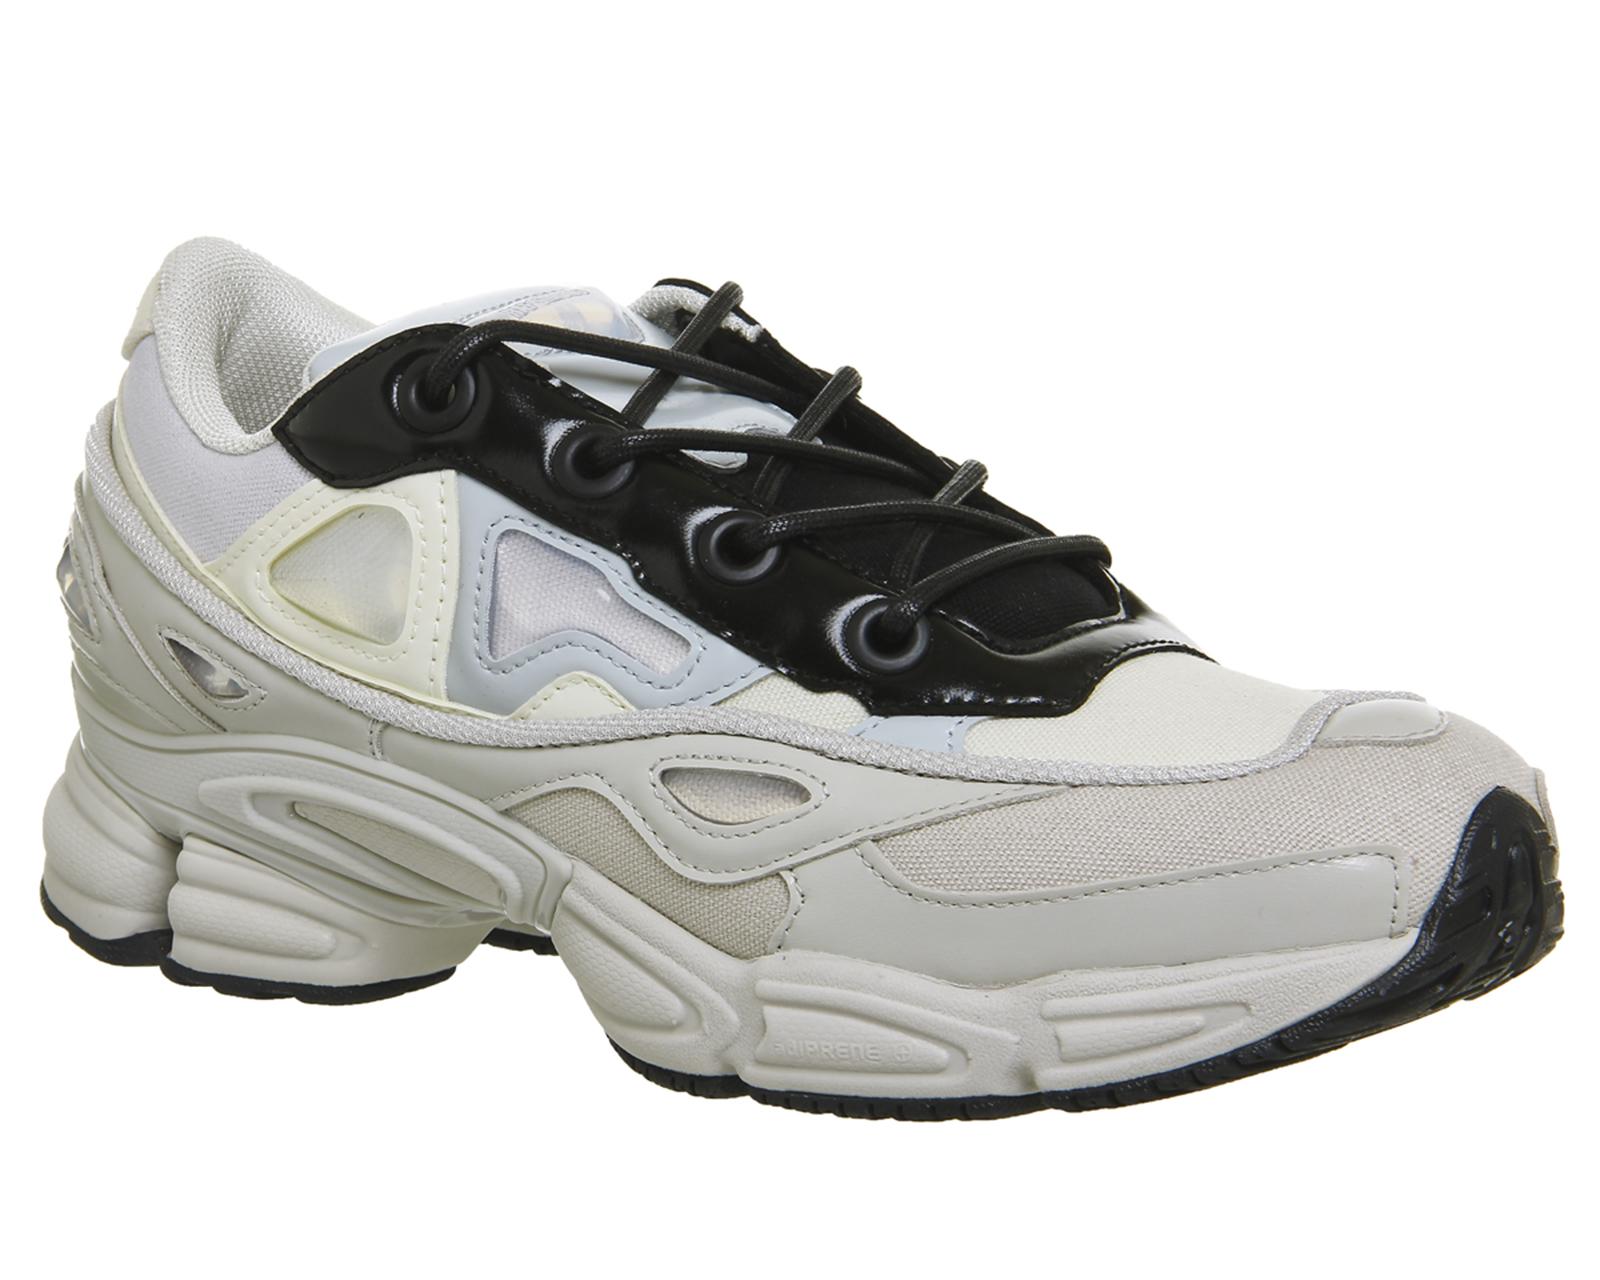 adidas Raf Simons Ozweego Iii Cream Stone - His trainers